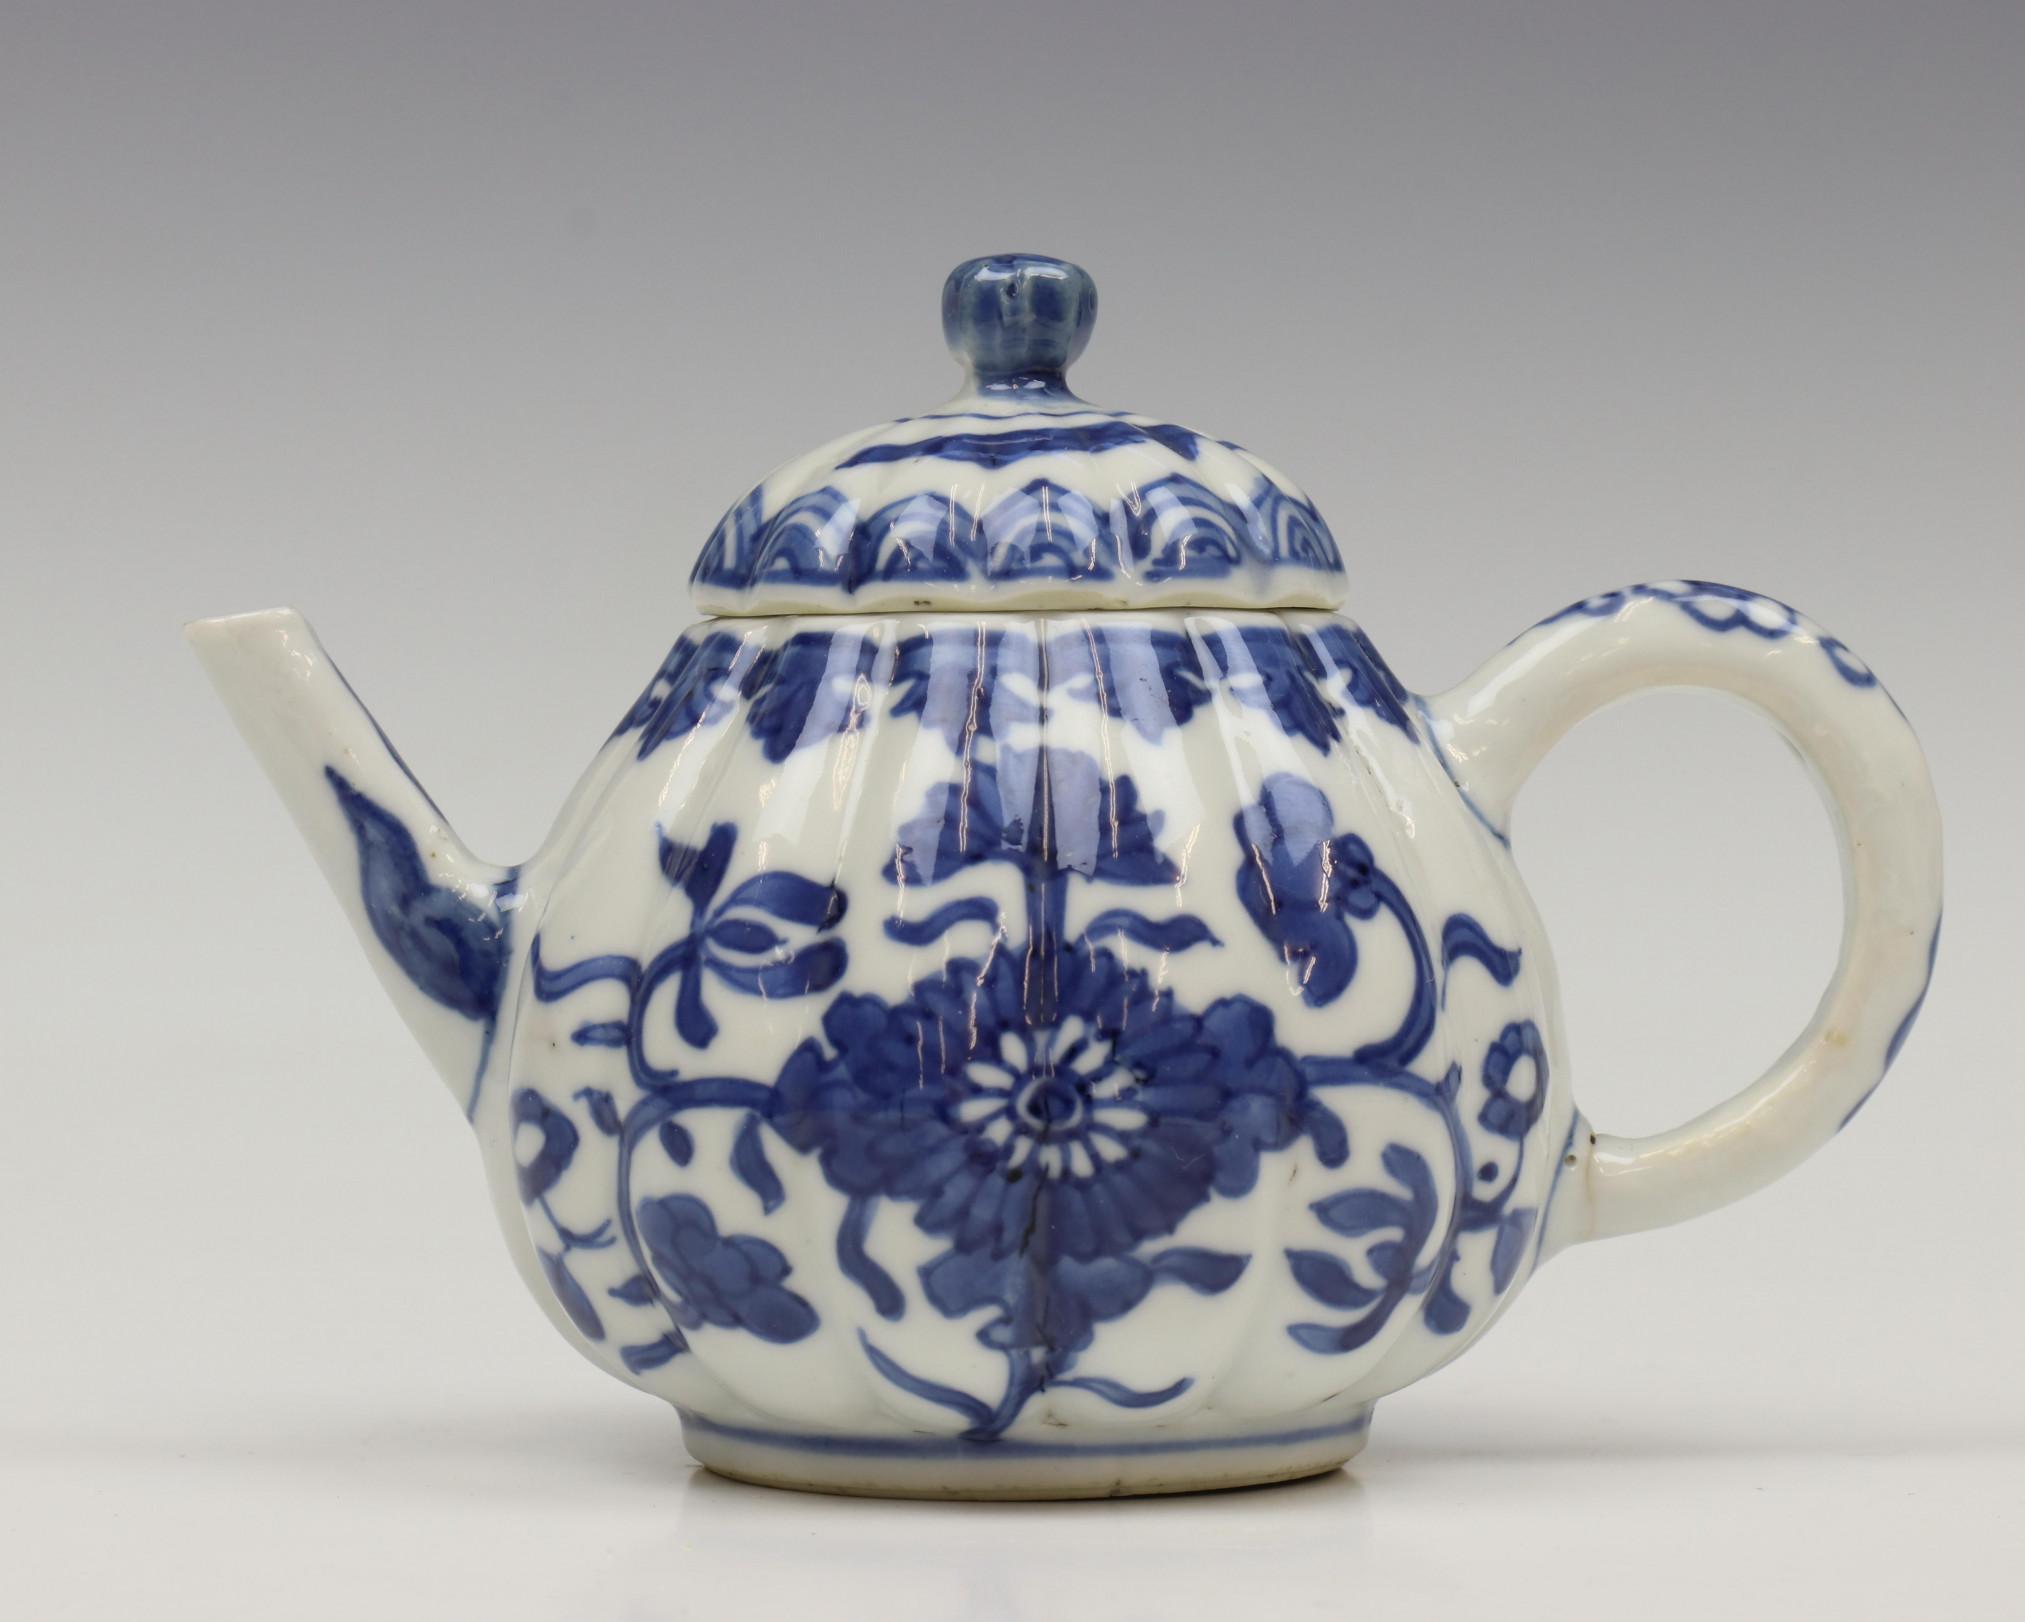 China, blauw-wit porseleinen gelobd trekpotje, Kangxi, - Image 5 of 6